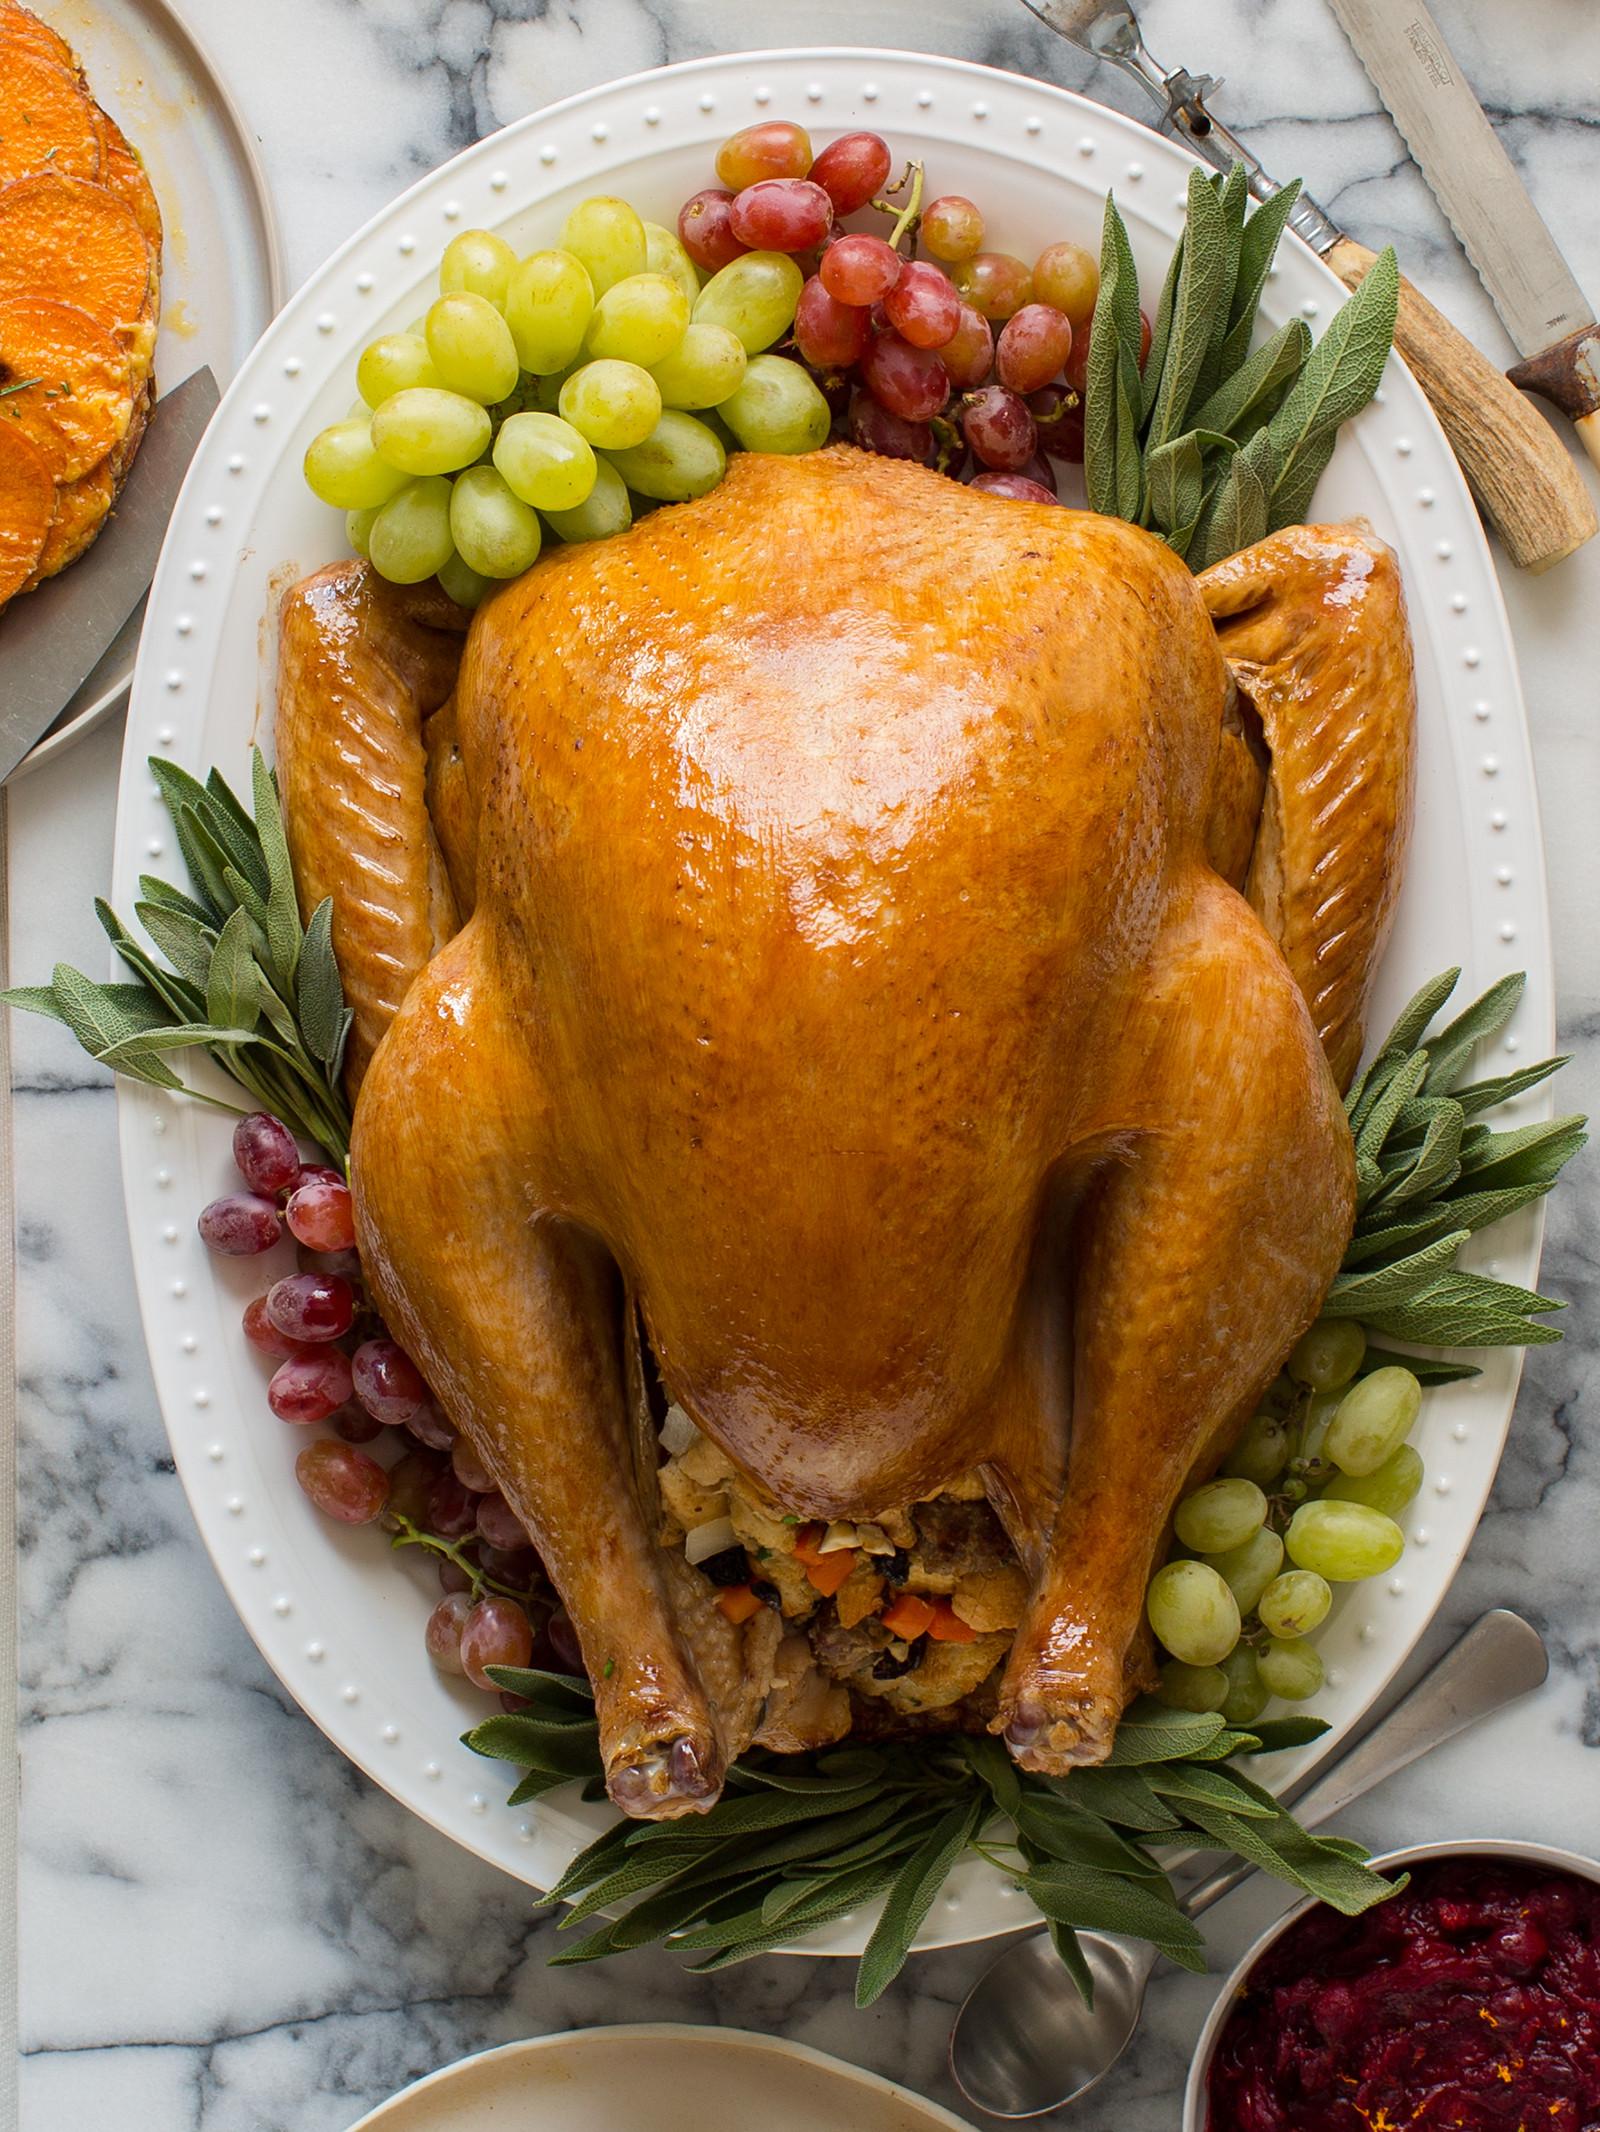 Roast Turkey Recipes Thanksgiving  Citrus and Herb Roasted Turkey Thanksgiving